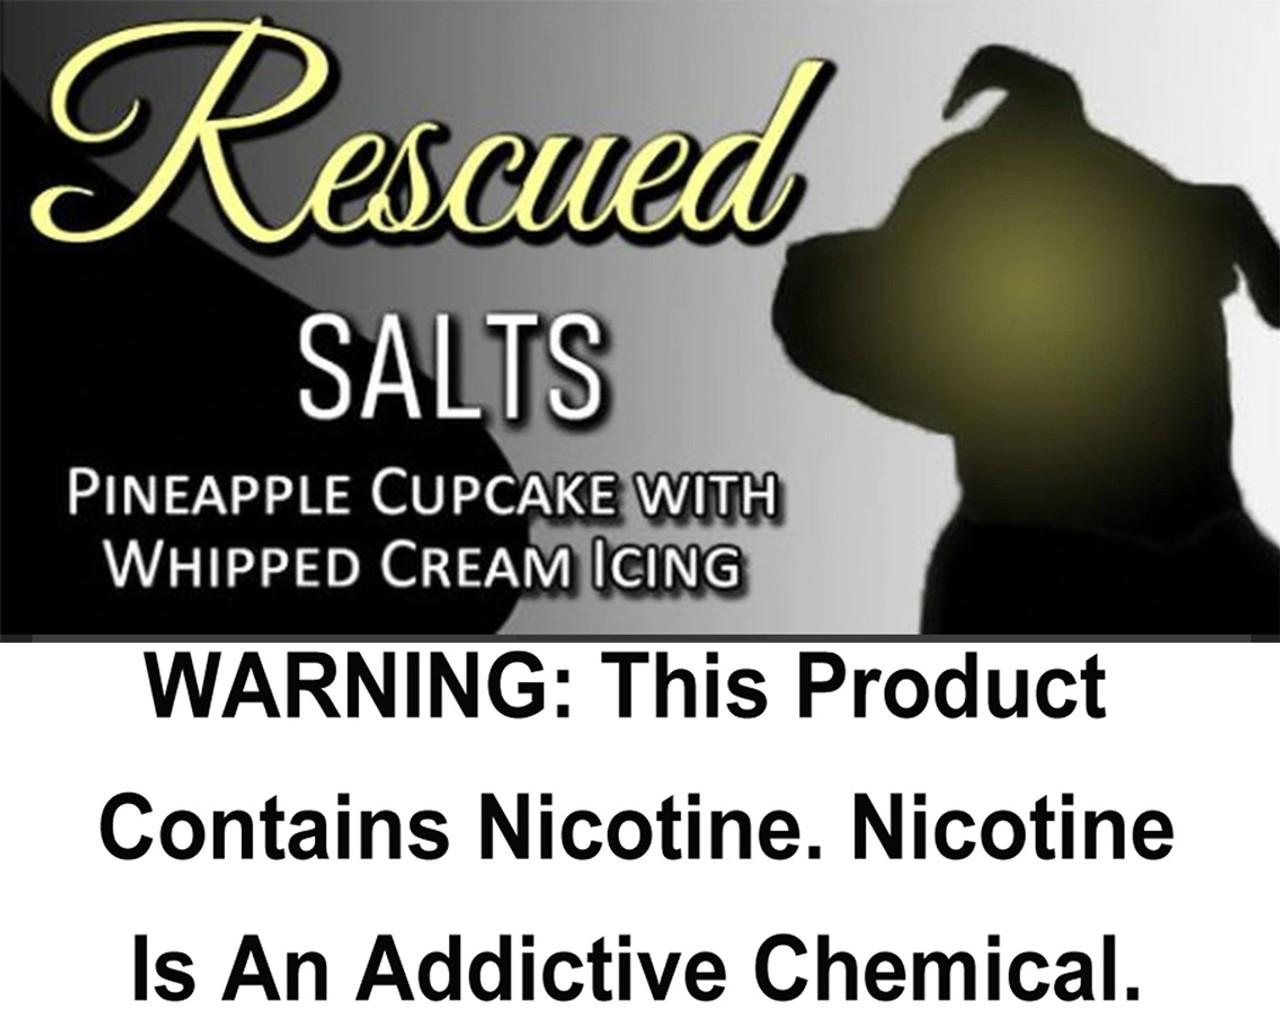 Rescued - Salt Nicotine 30ml